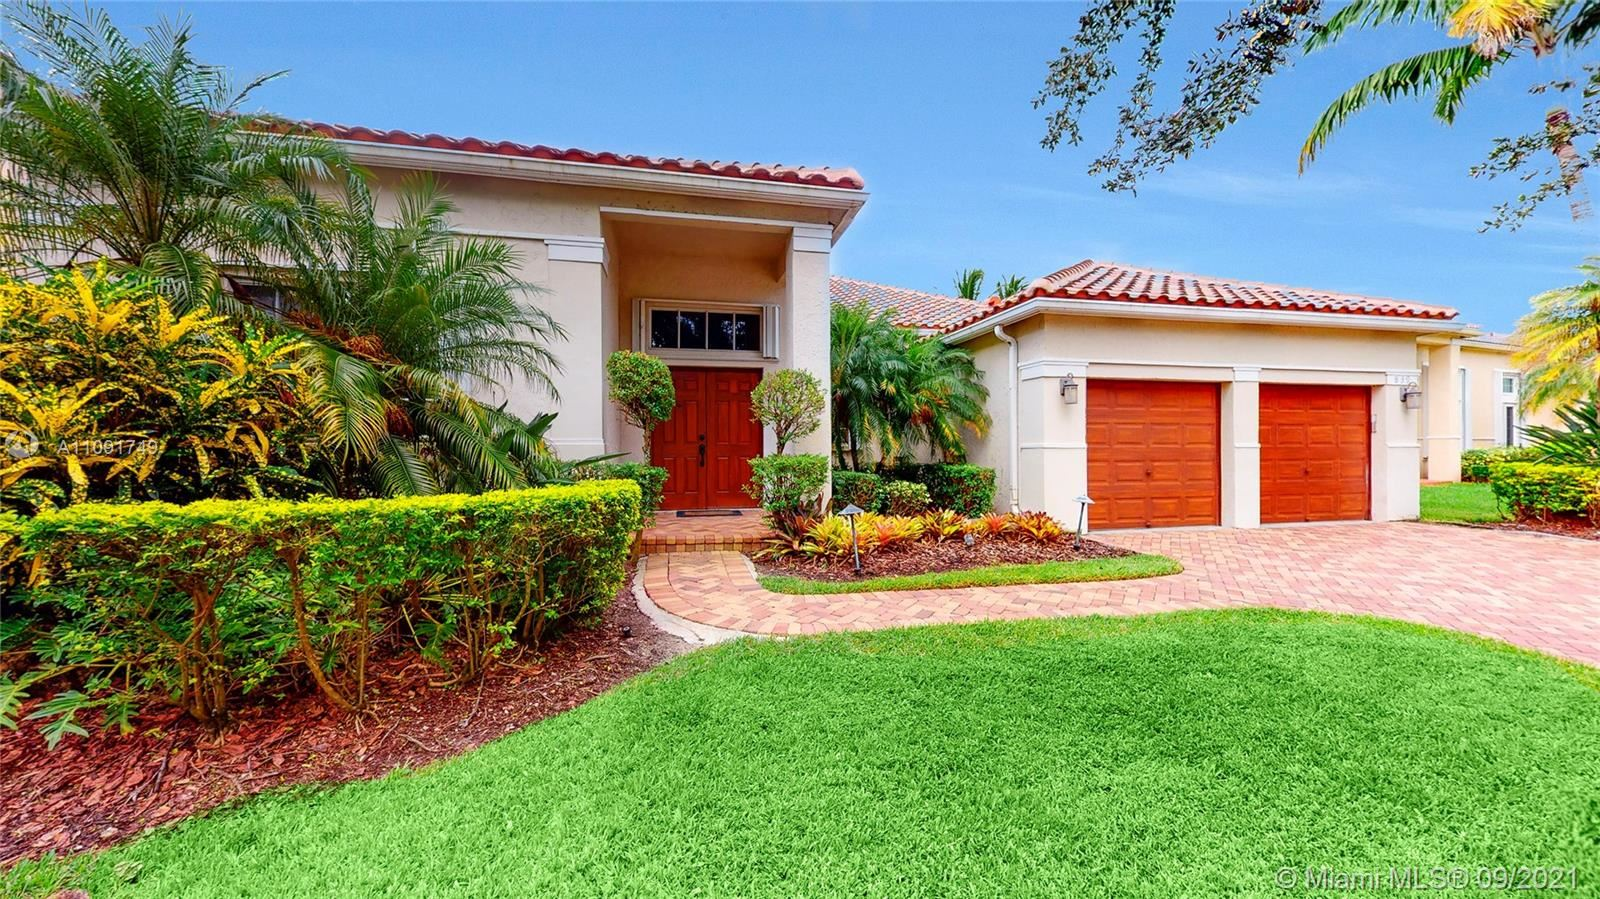 839 Heritage Dr, Weston, FL 33326 - #: A11091749